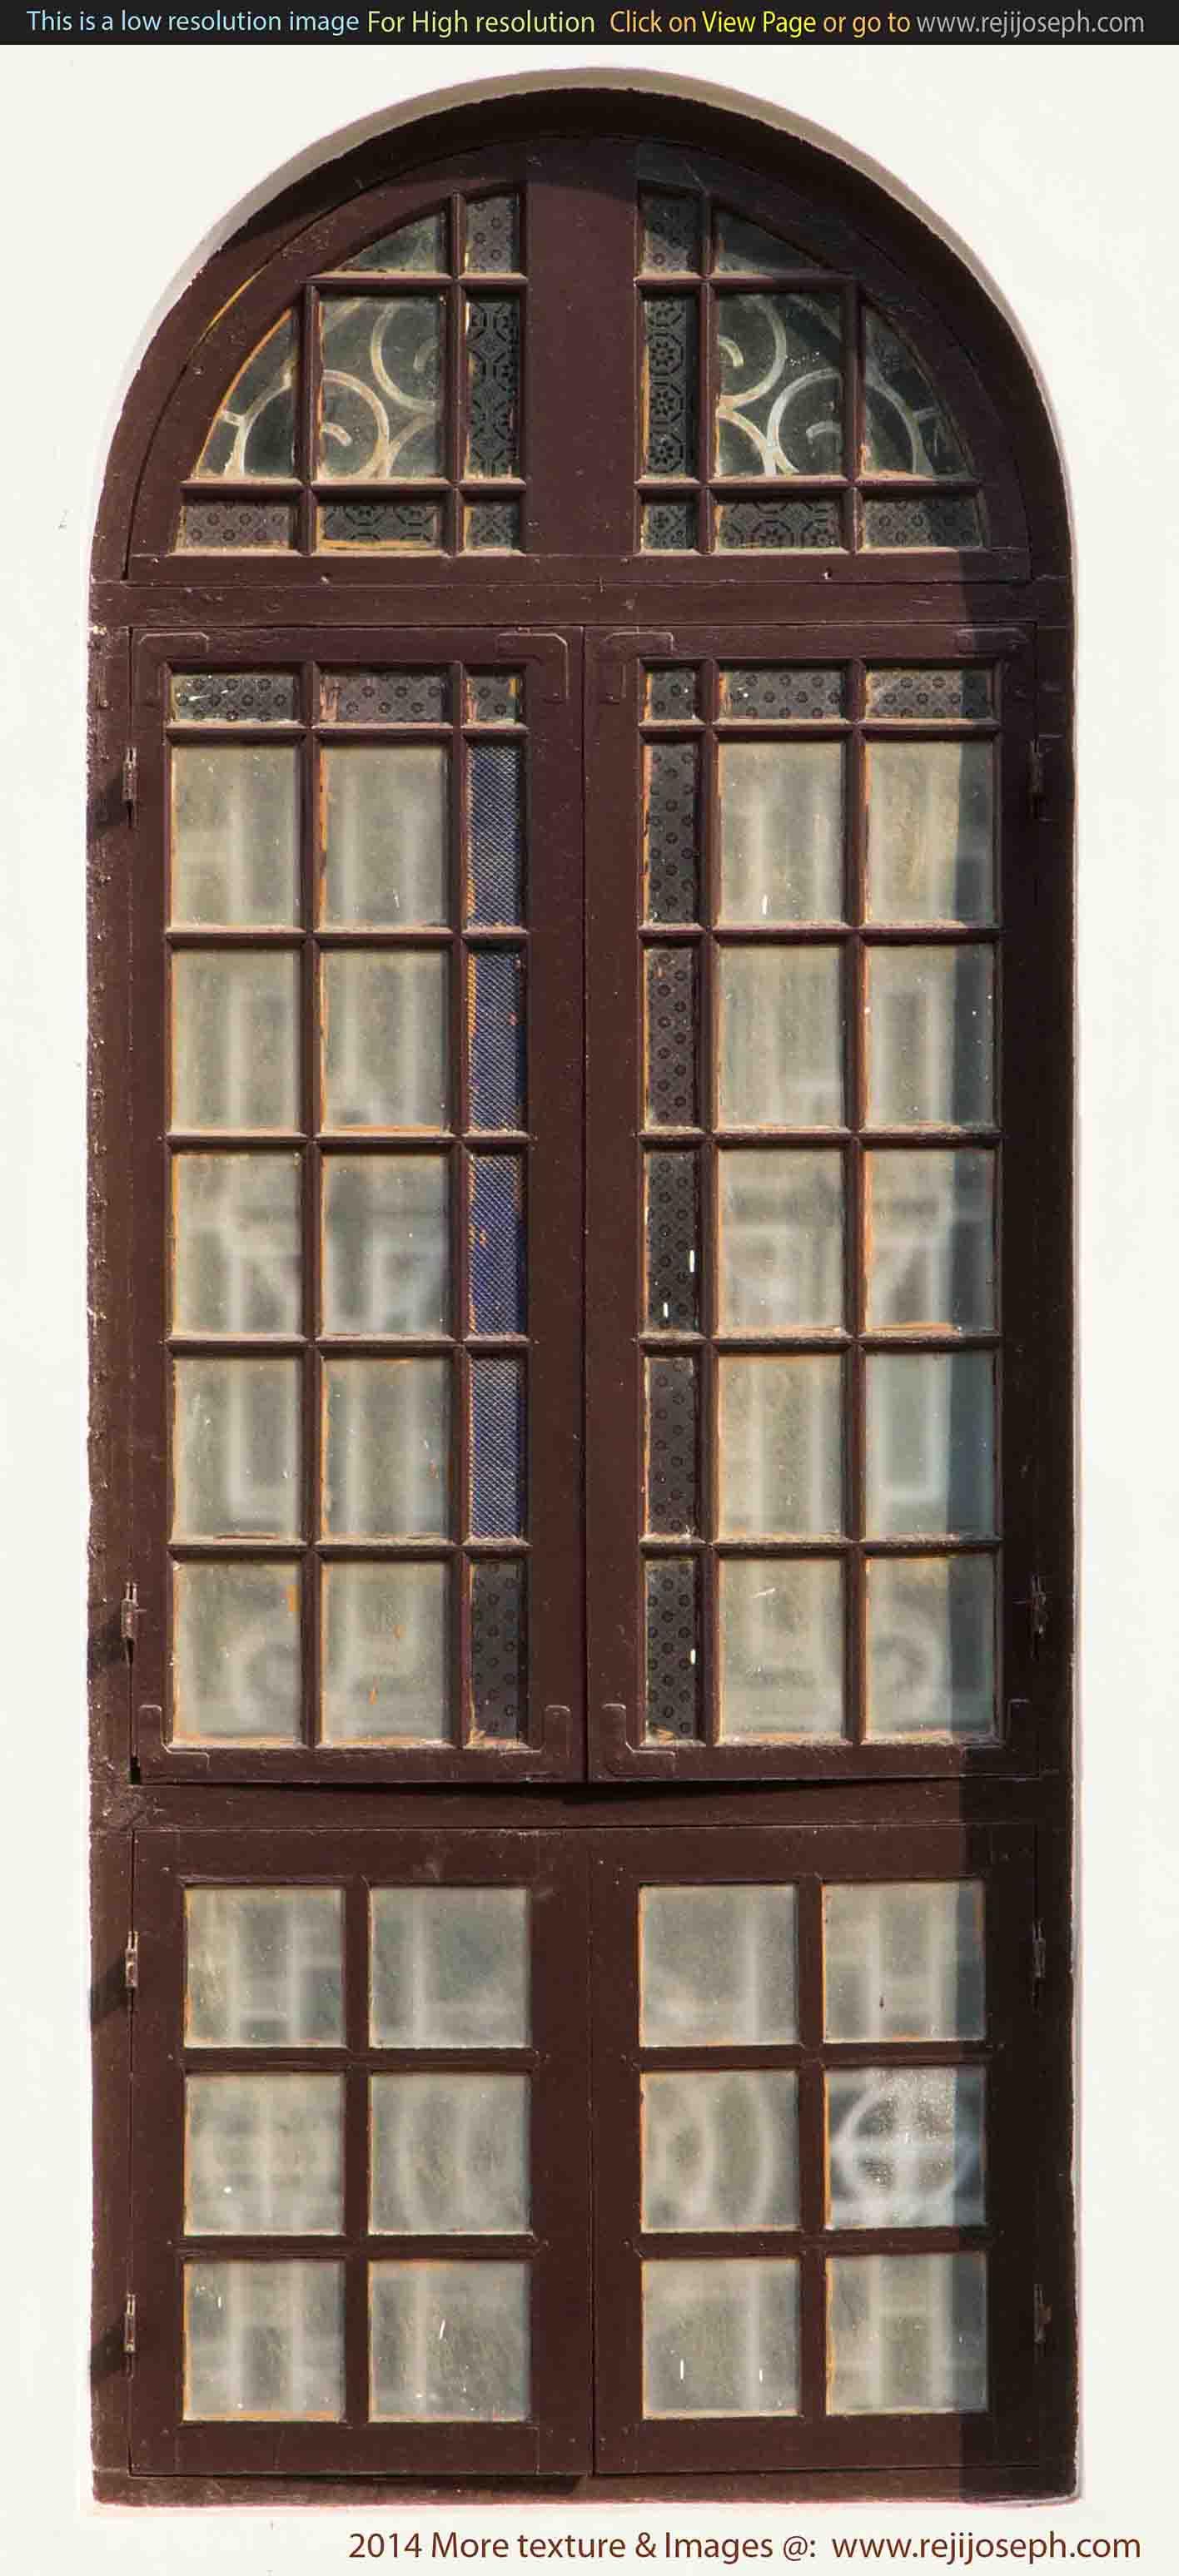 Arch Window texture 00002